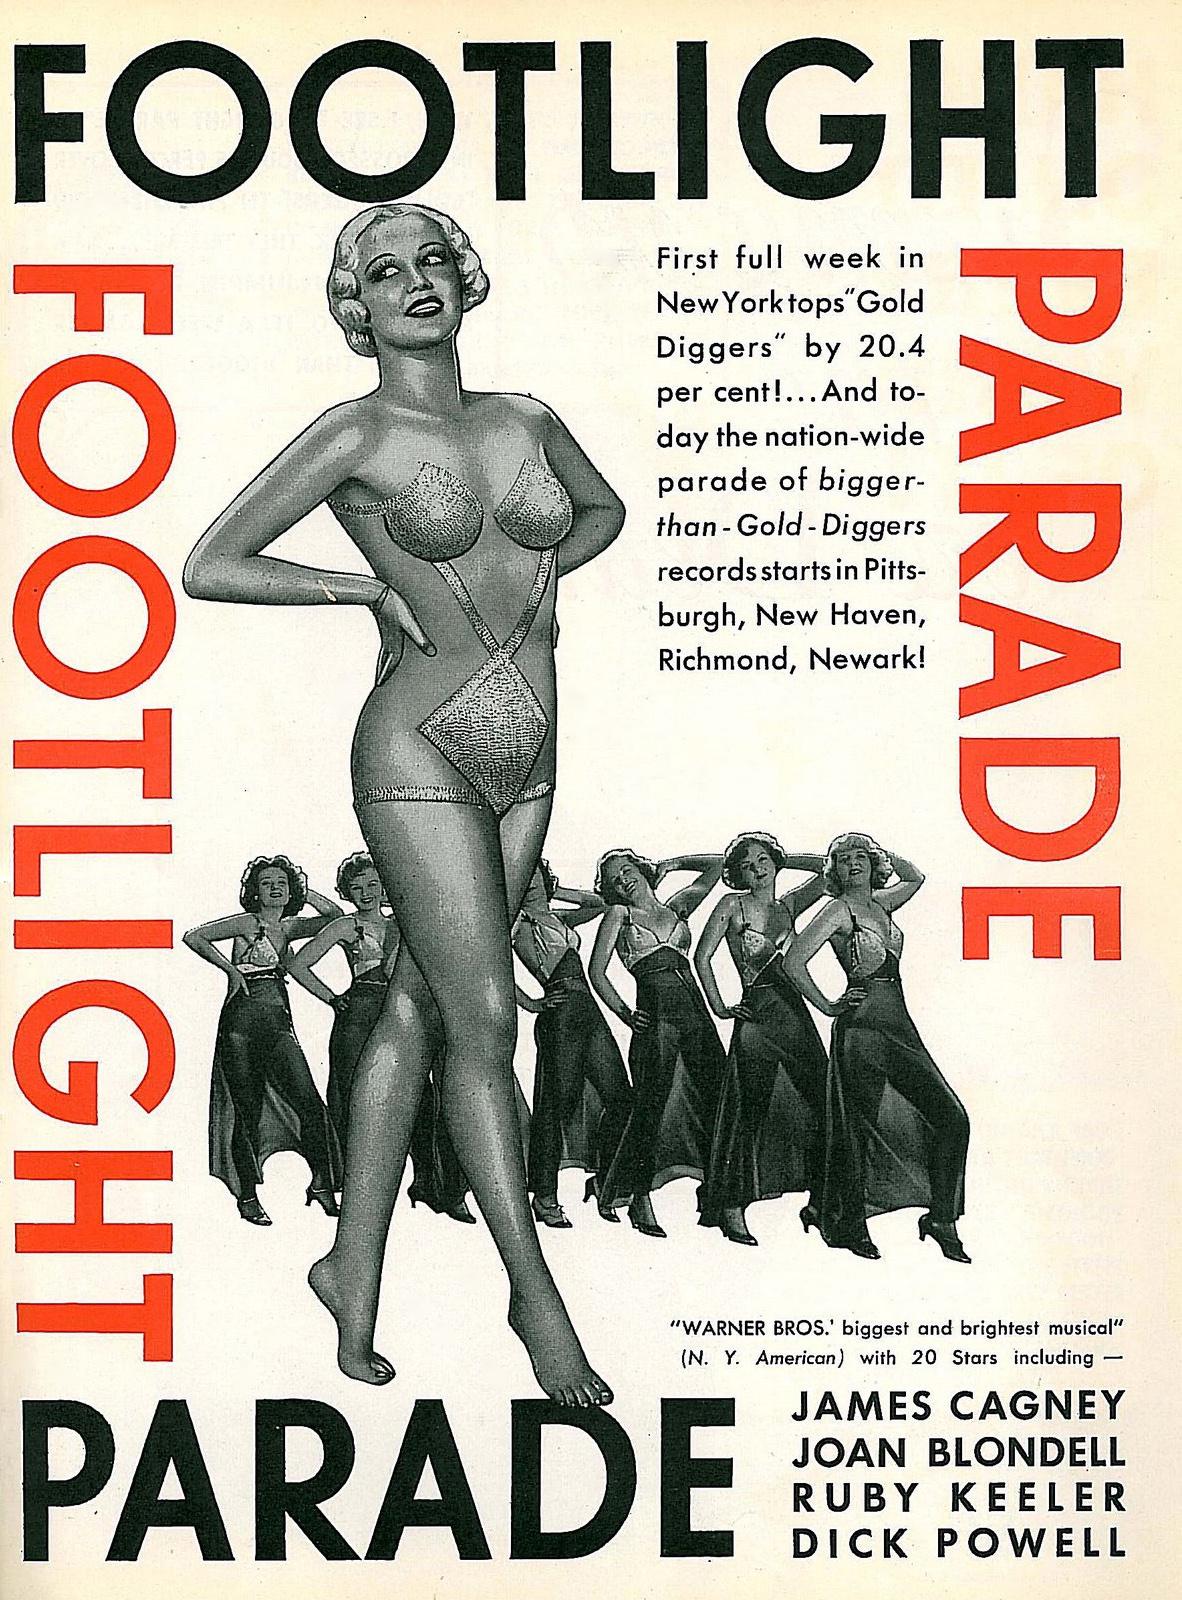 Marlo Dwyer, Patsy Farnum, Patricia Farr, Gloria Faythe, Ruby Keeler, Marietta Myers, and Pat Fara in Footlight Parade (1933)